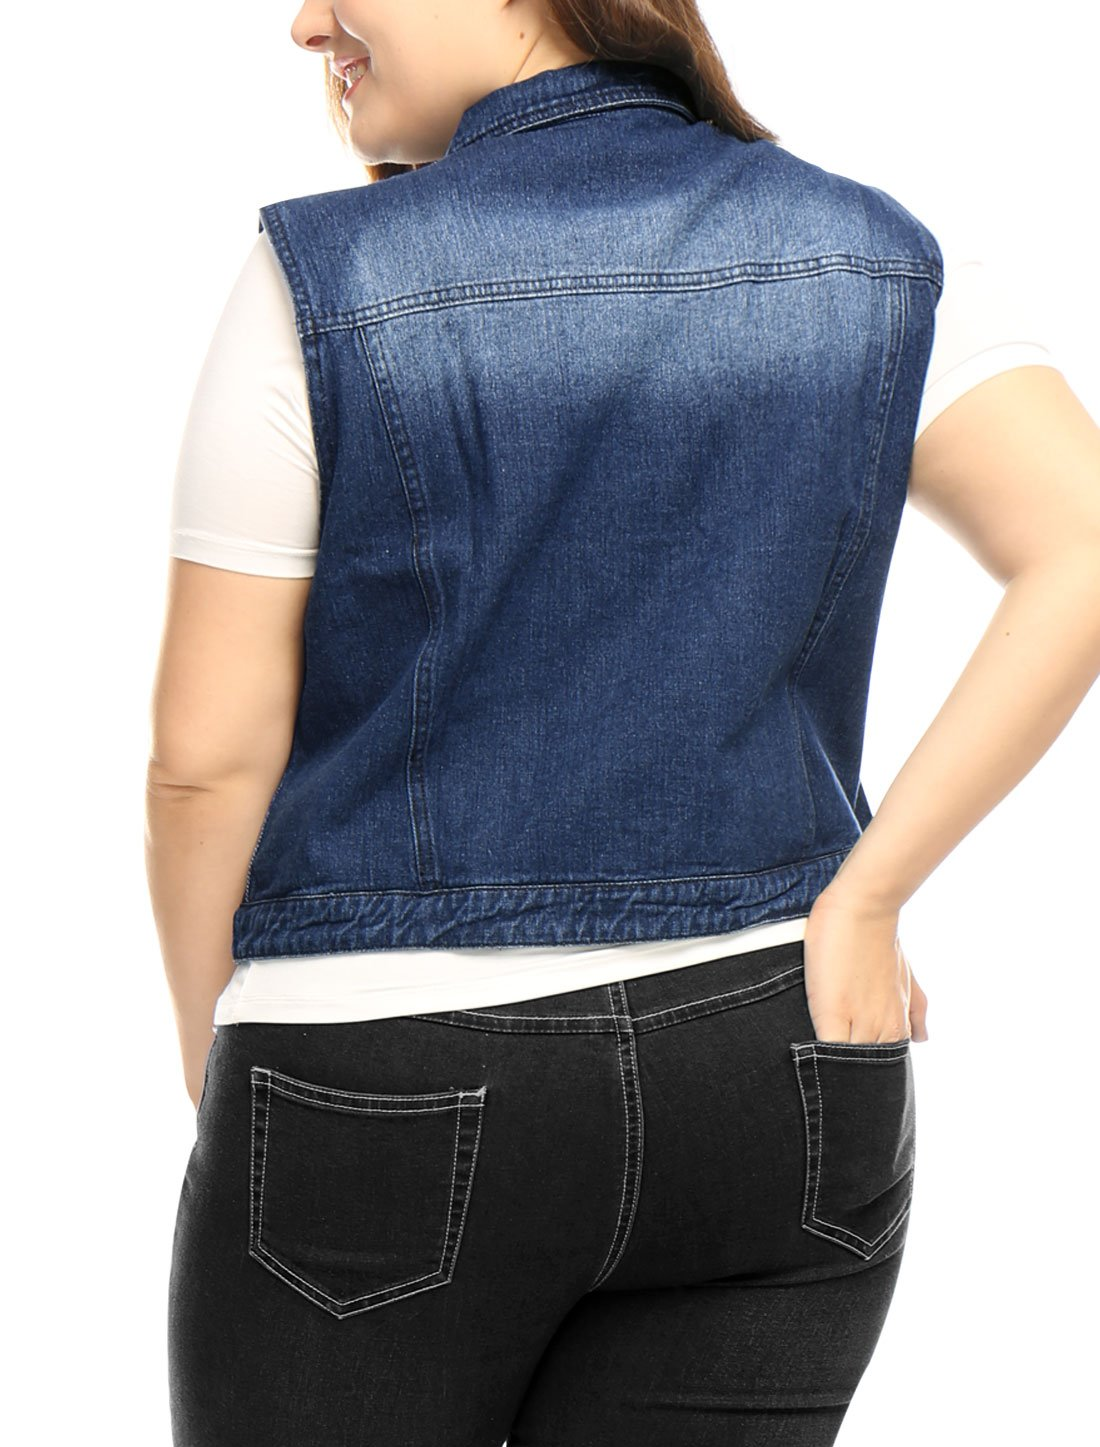 uxcell Women Plus Size Slim Fit Denim Vest Blue 1X by uxcell (Image #5)